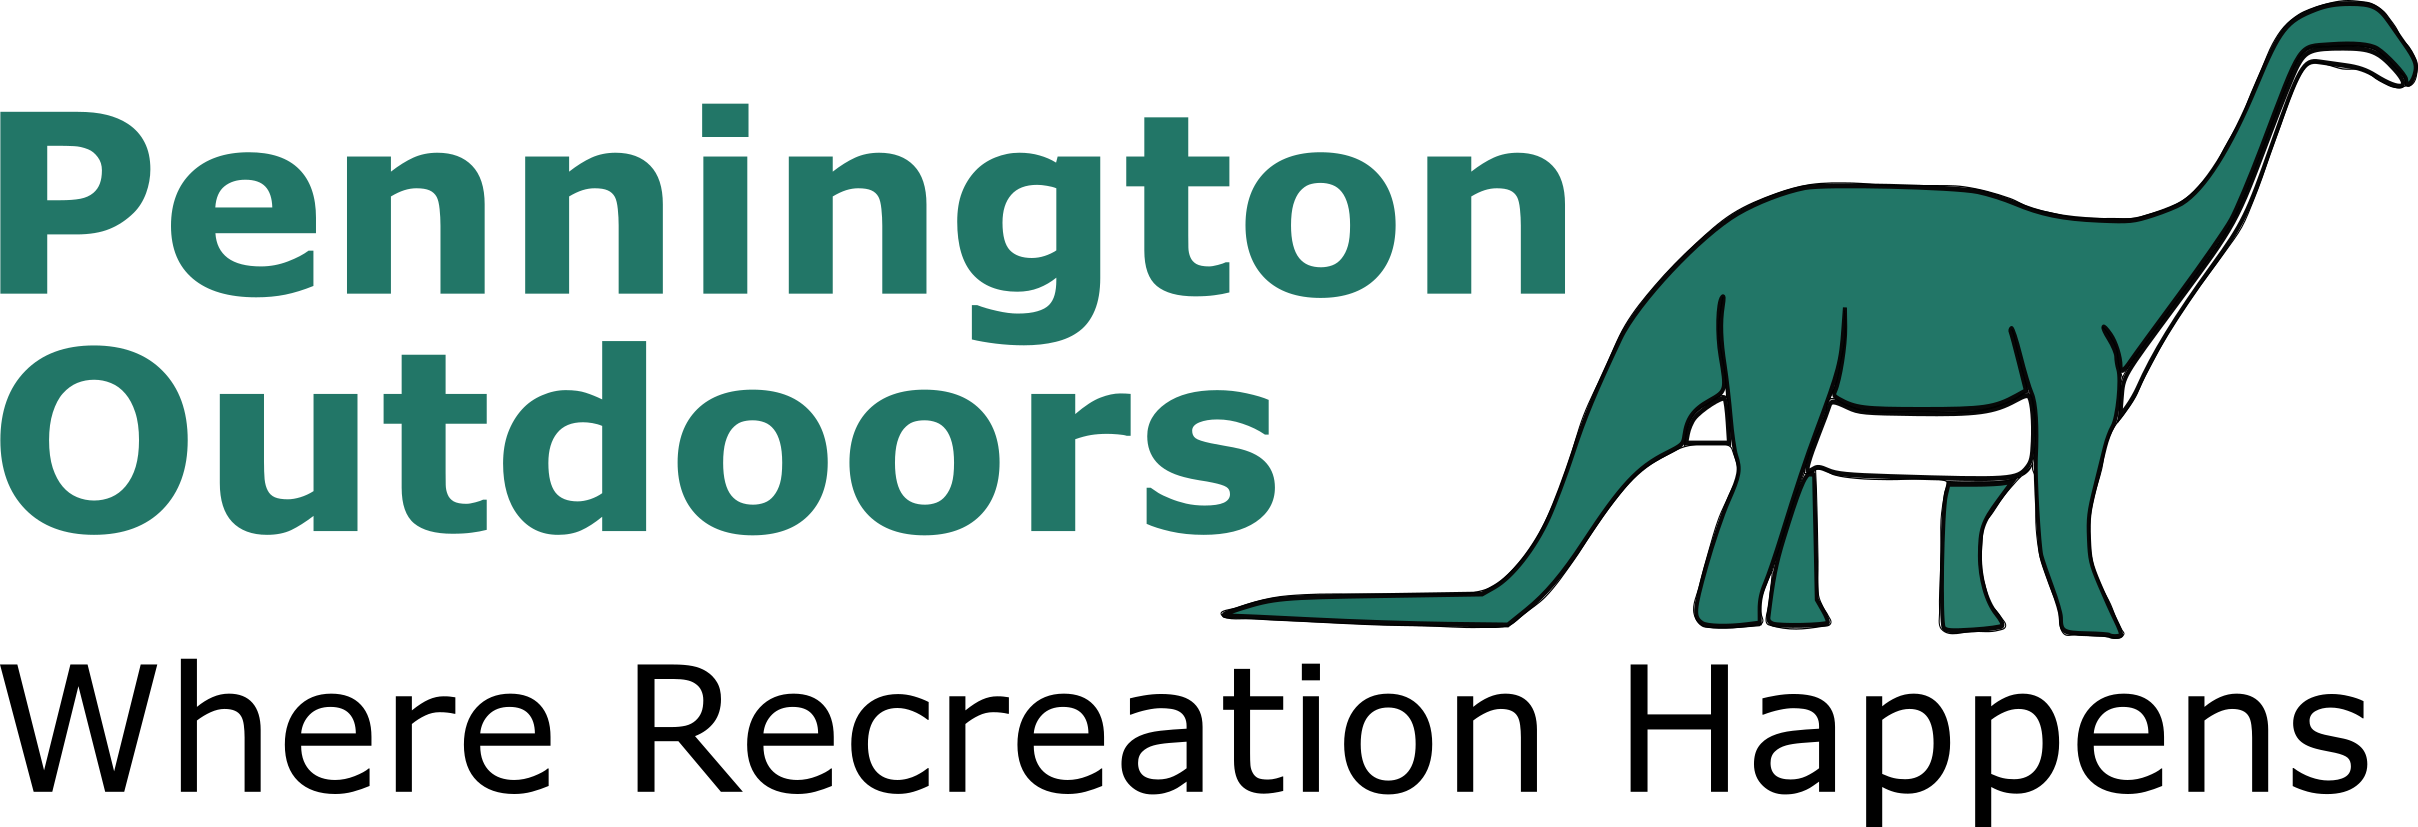 Pennington Outdoors web site thumbnail